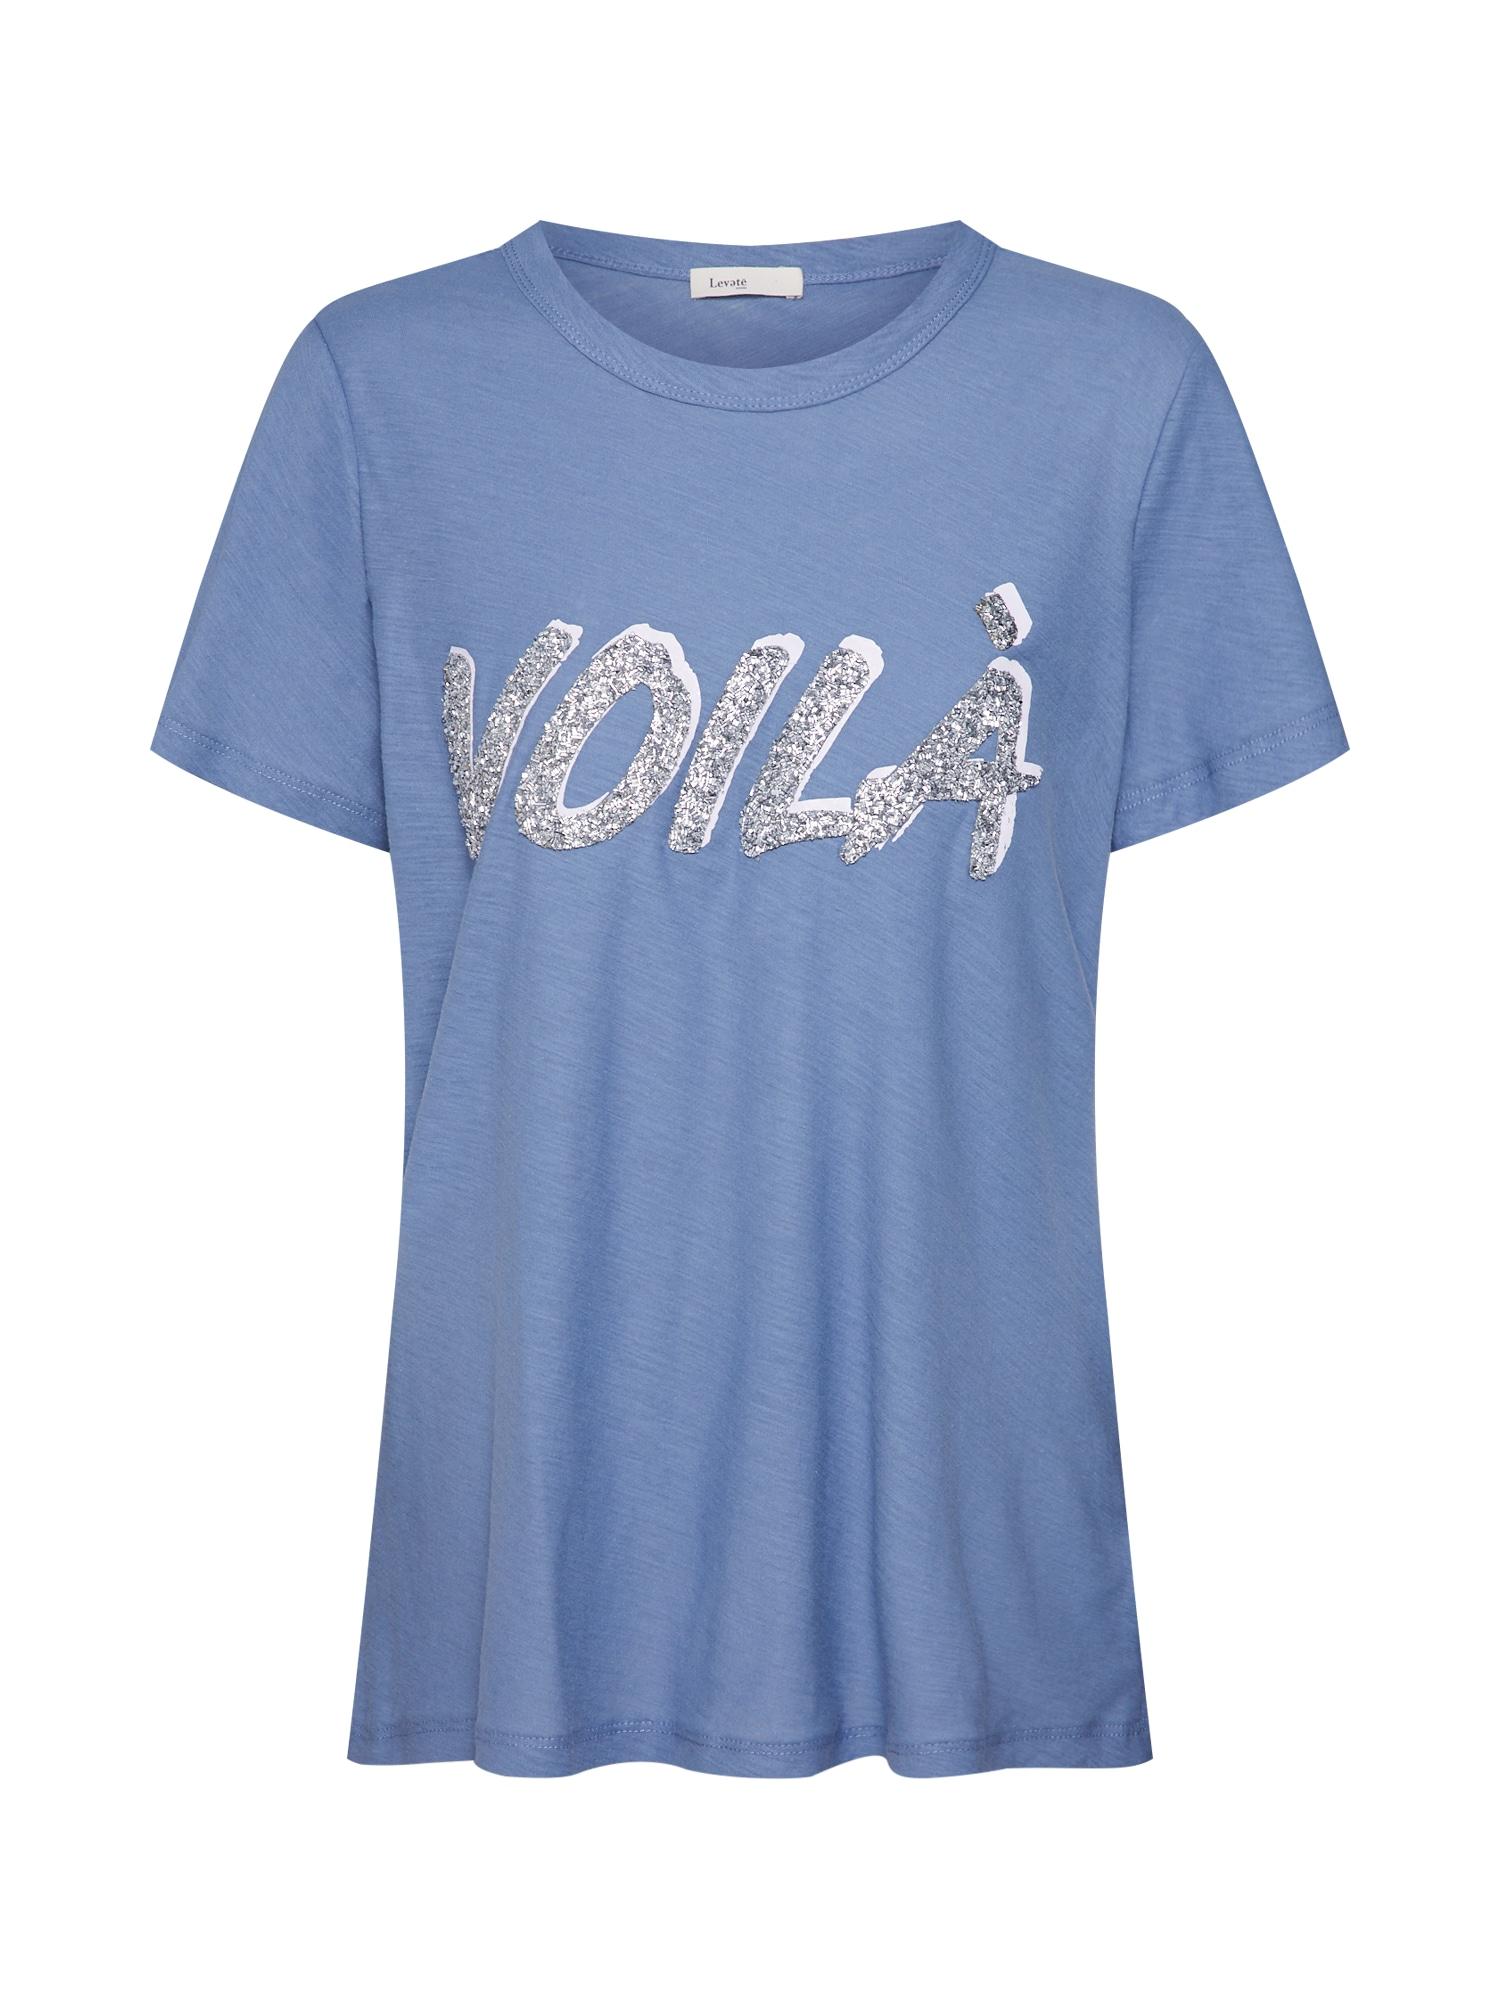 Tričko LR-ALVINA 13 modrá stříbrná Levete Room